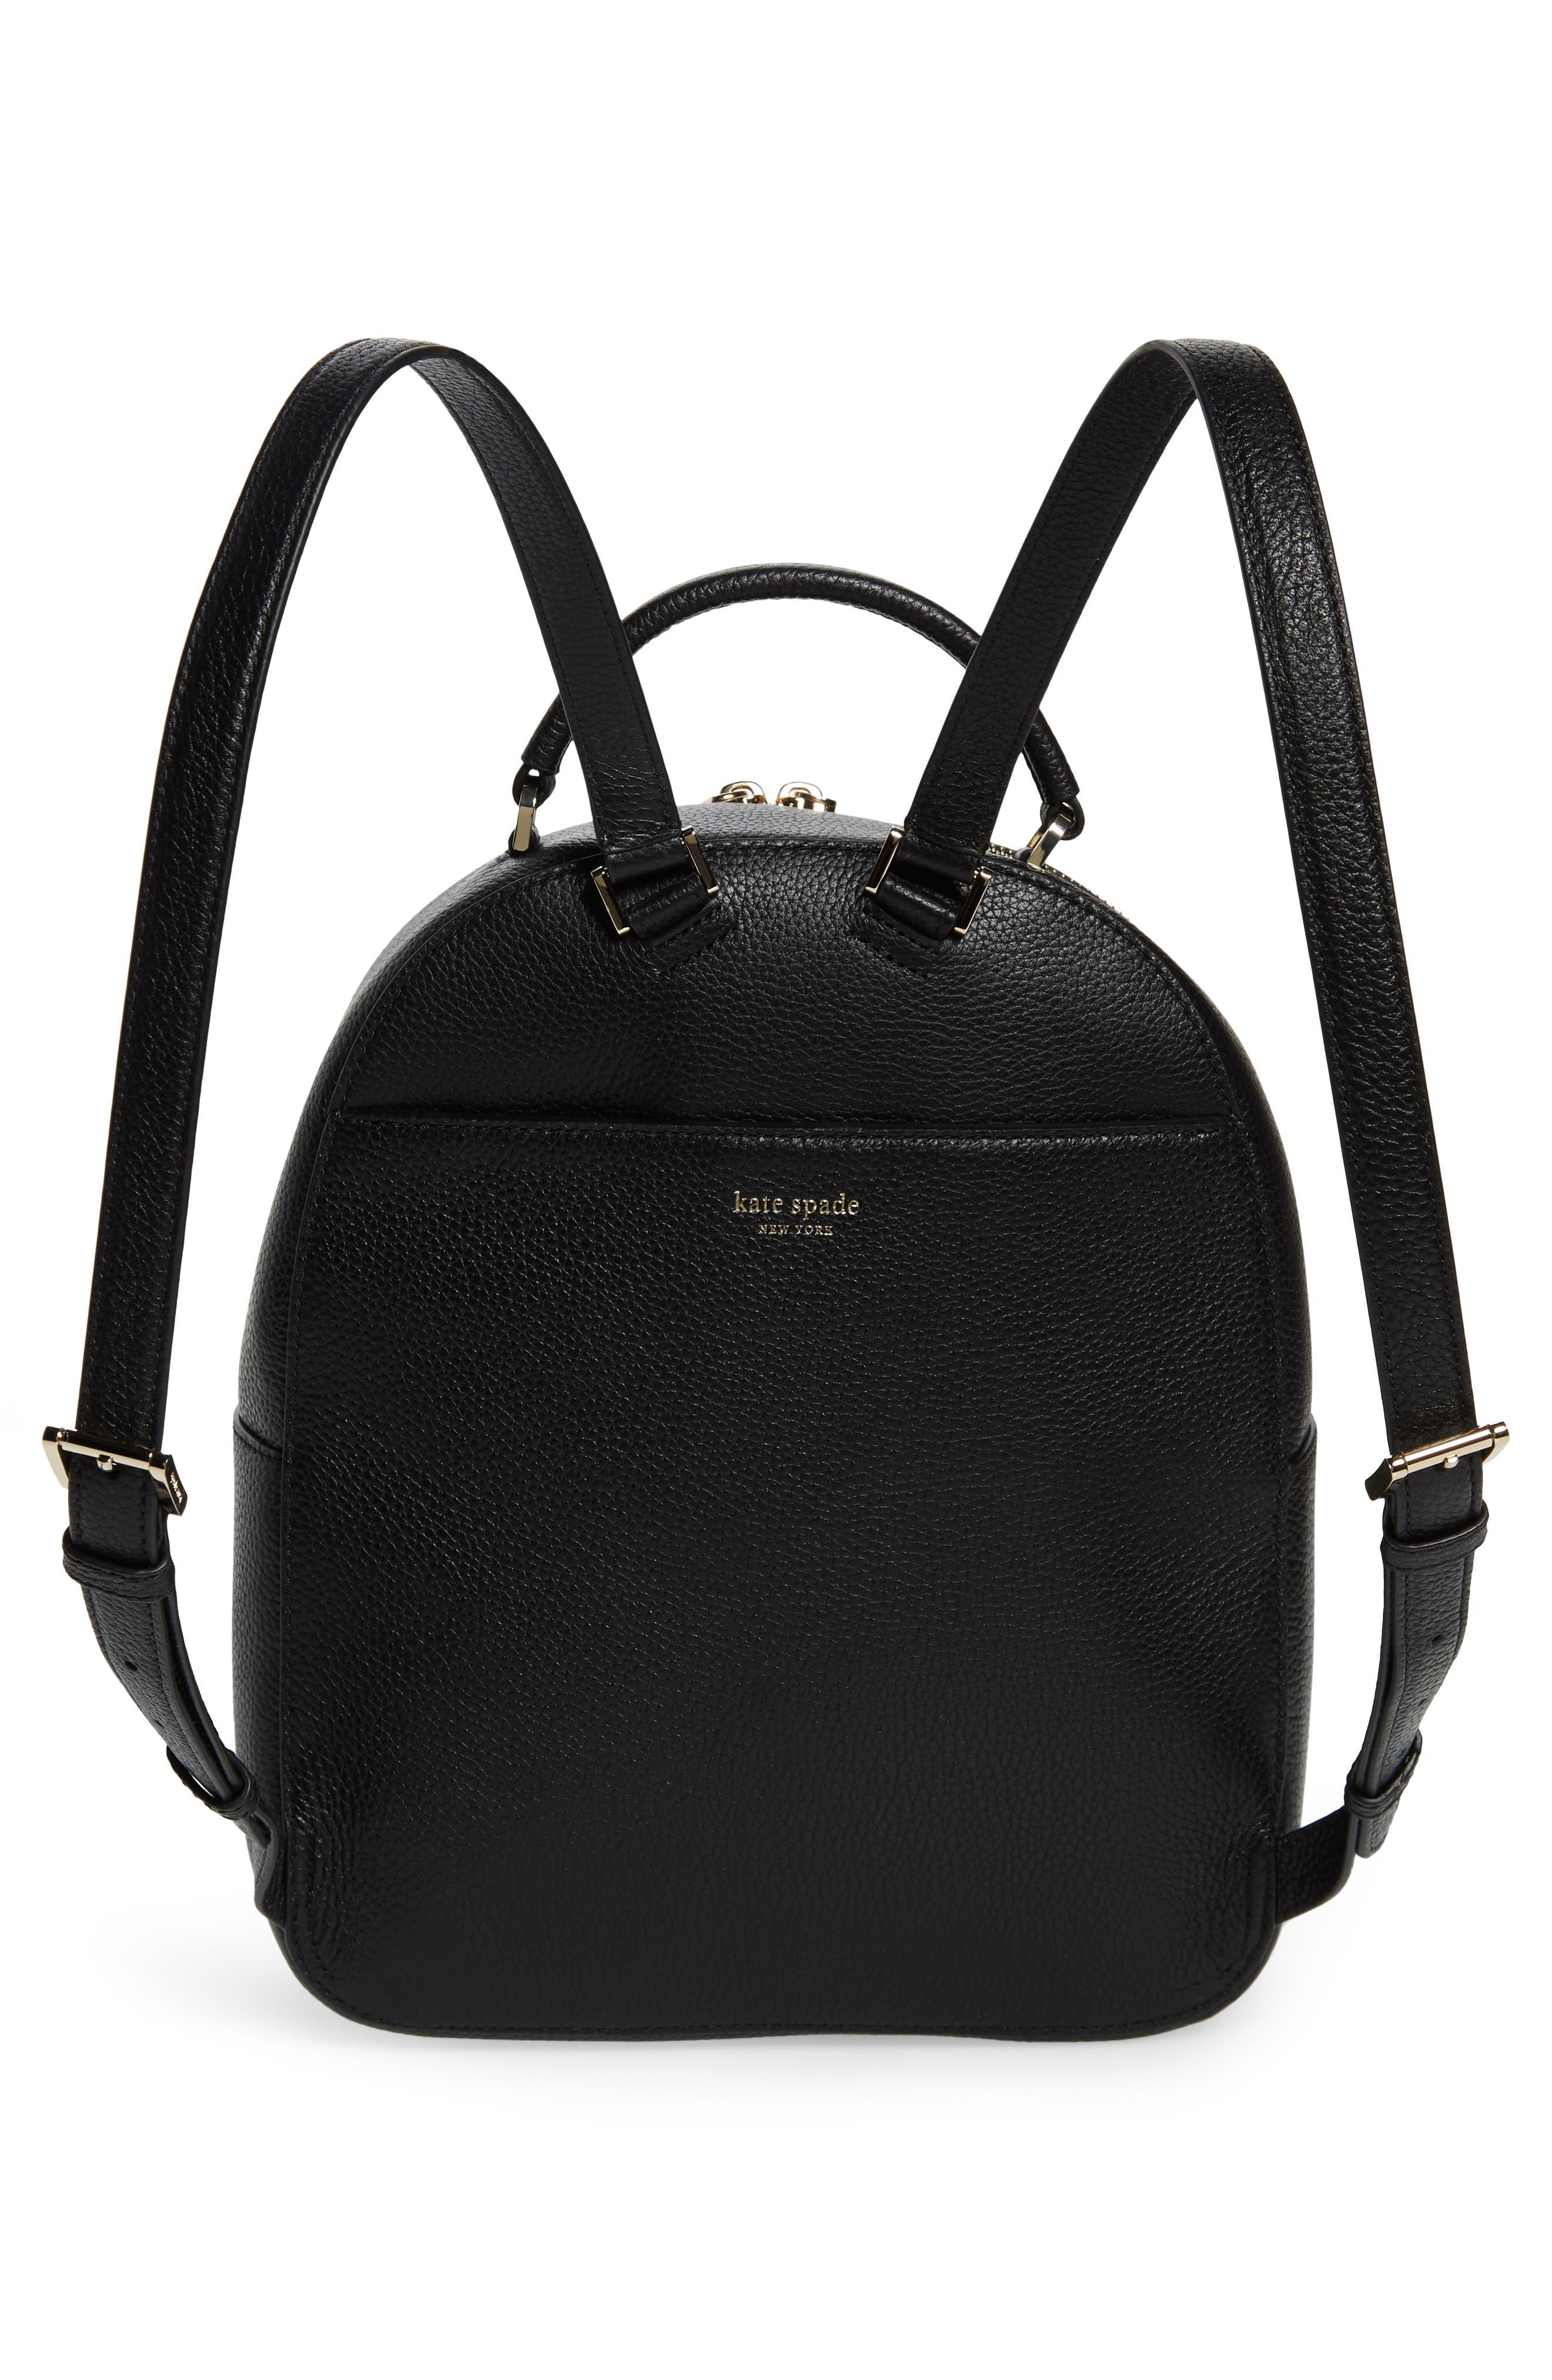 KATE SPADE NEW YORK, medium polly leather backpack, Alternate thumbnail 3, color, BLACK